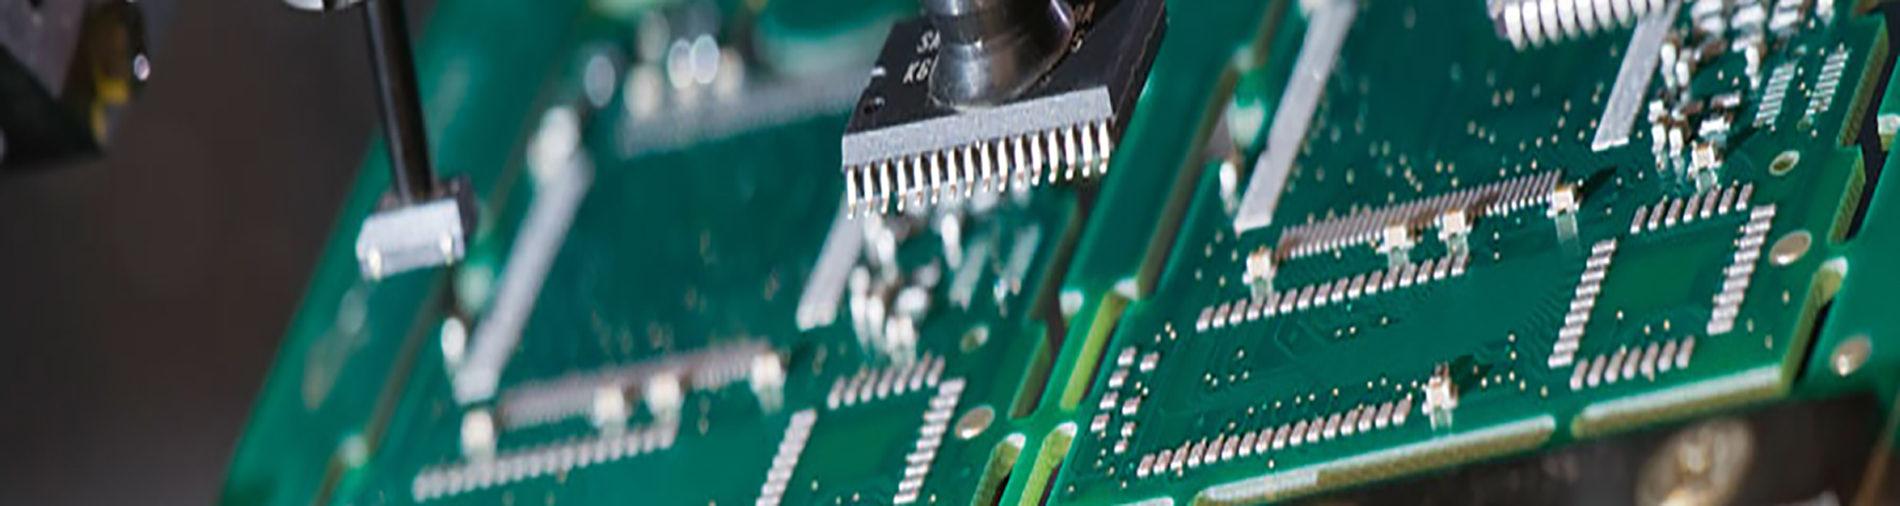 Printed Circuit Board Manufacturing Sealpump Process The